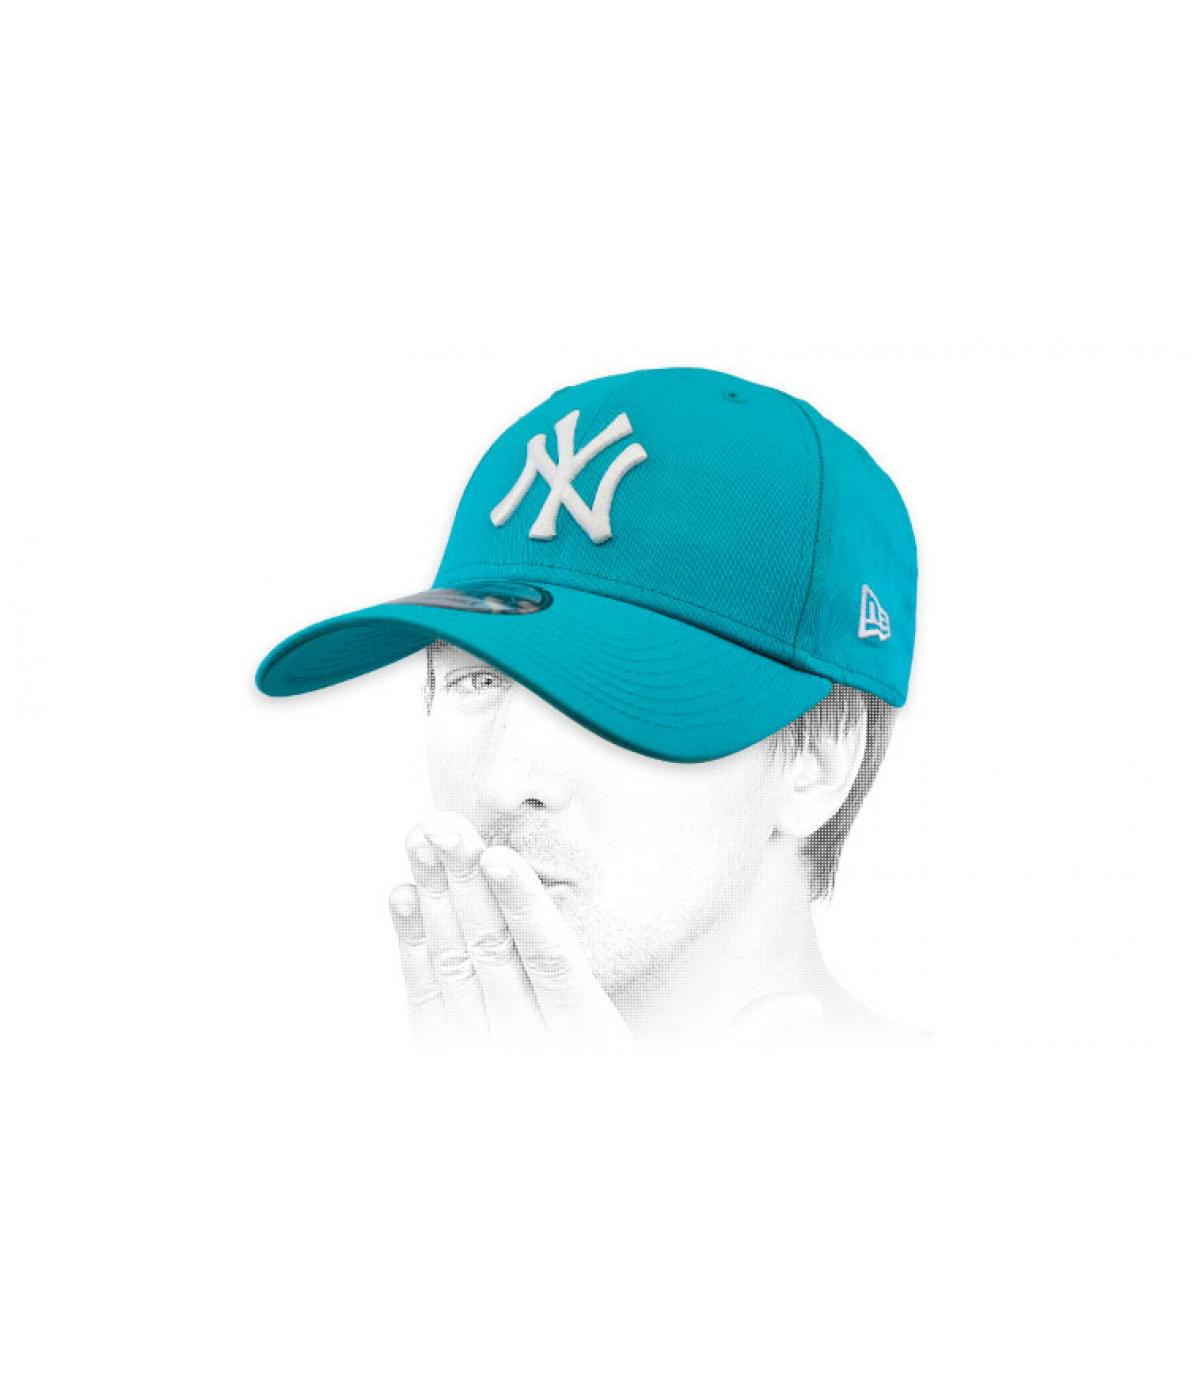 casquette NY bleu blanc